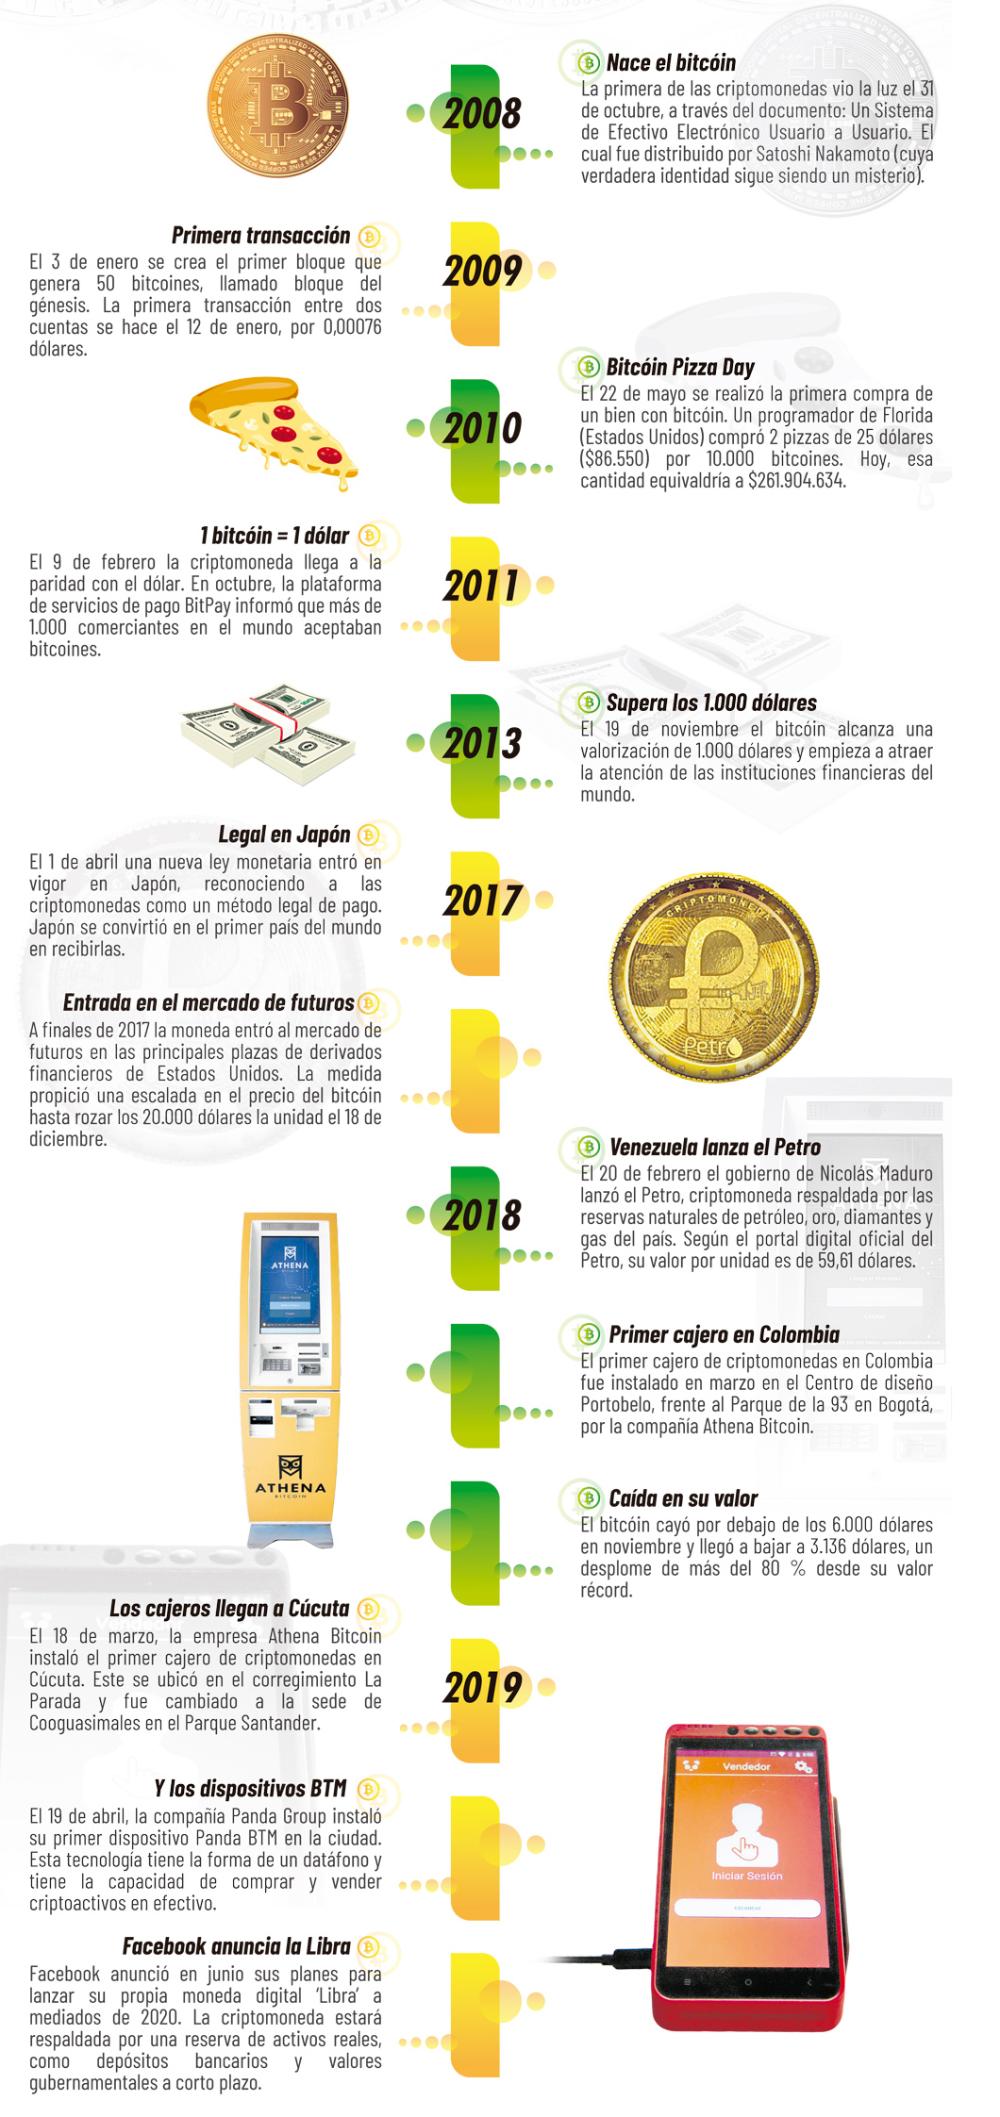 bitcoin miner CommLawBlog